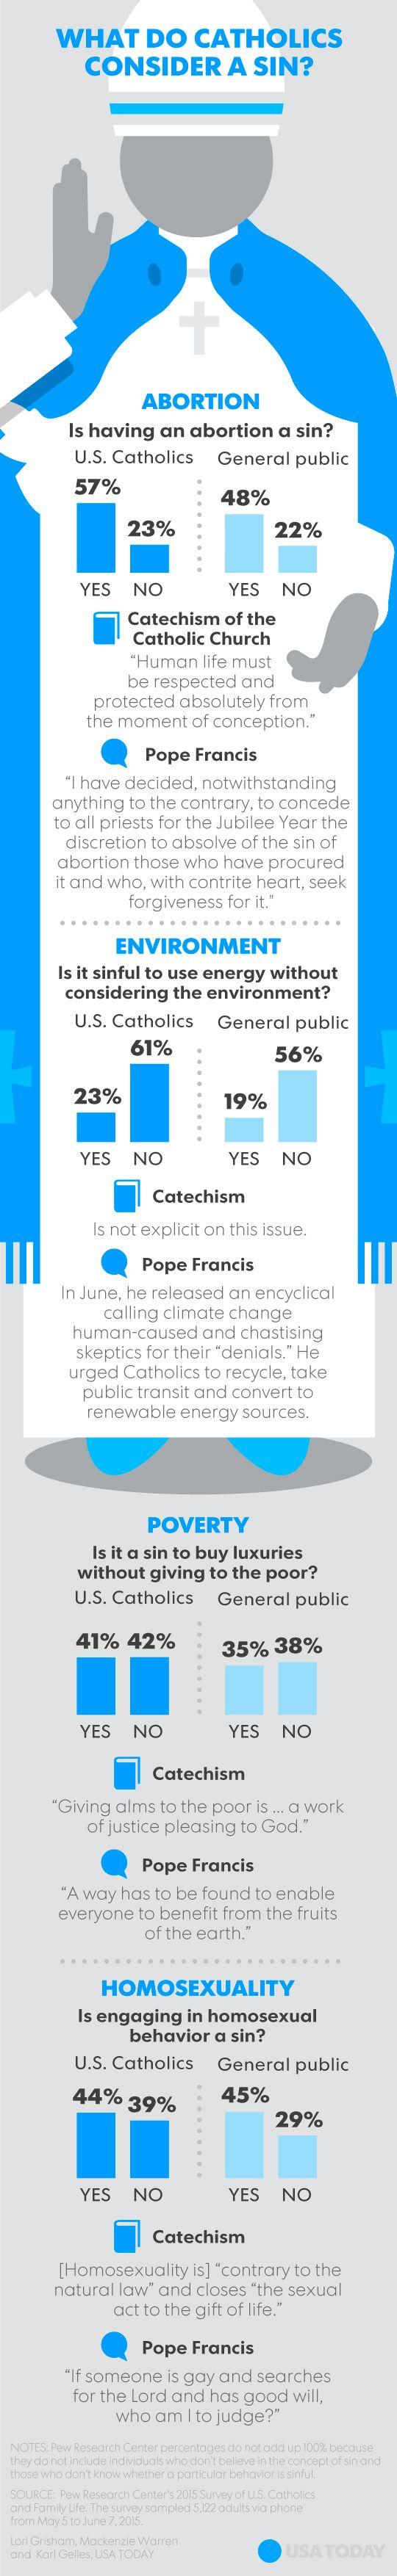 Like Pope Francis, many USA Catholics' beliefs surprising